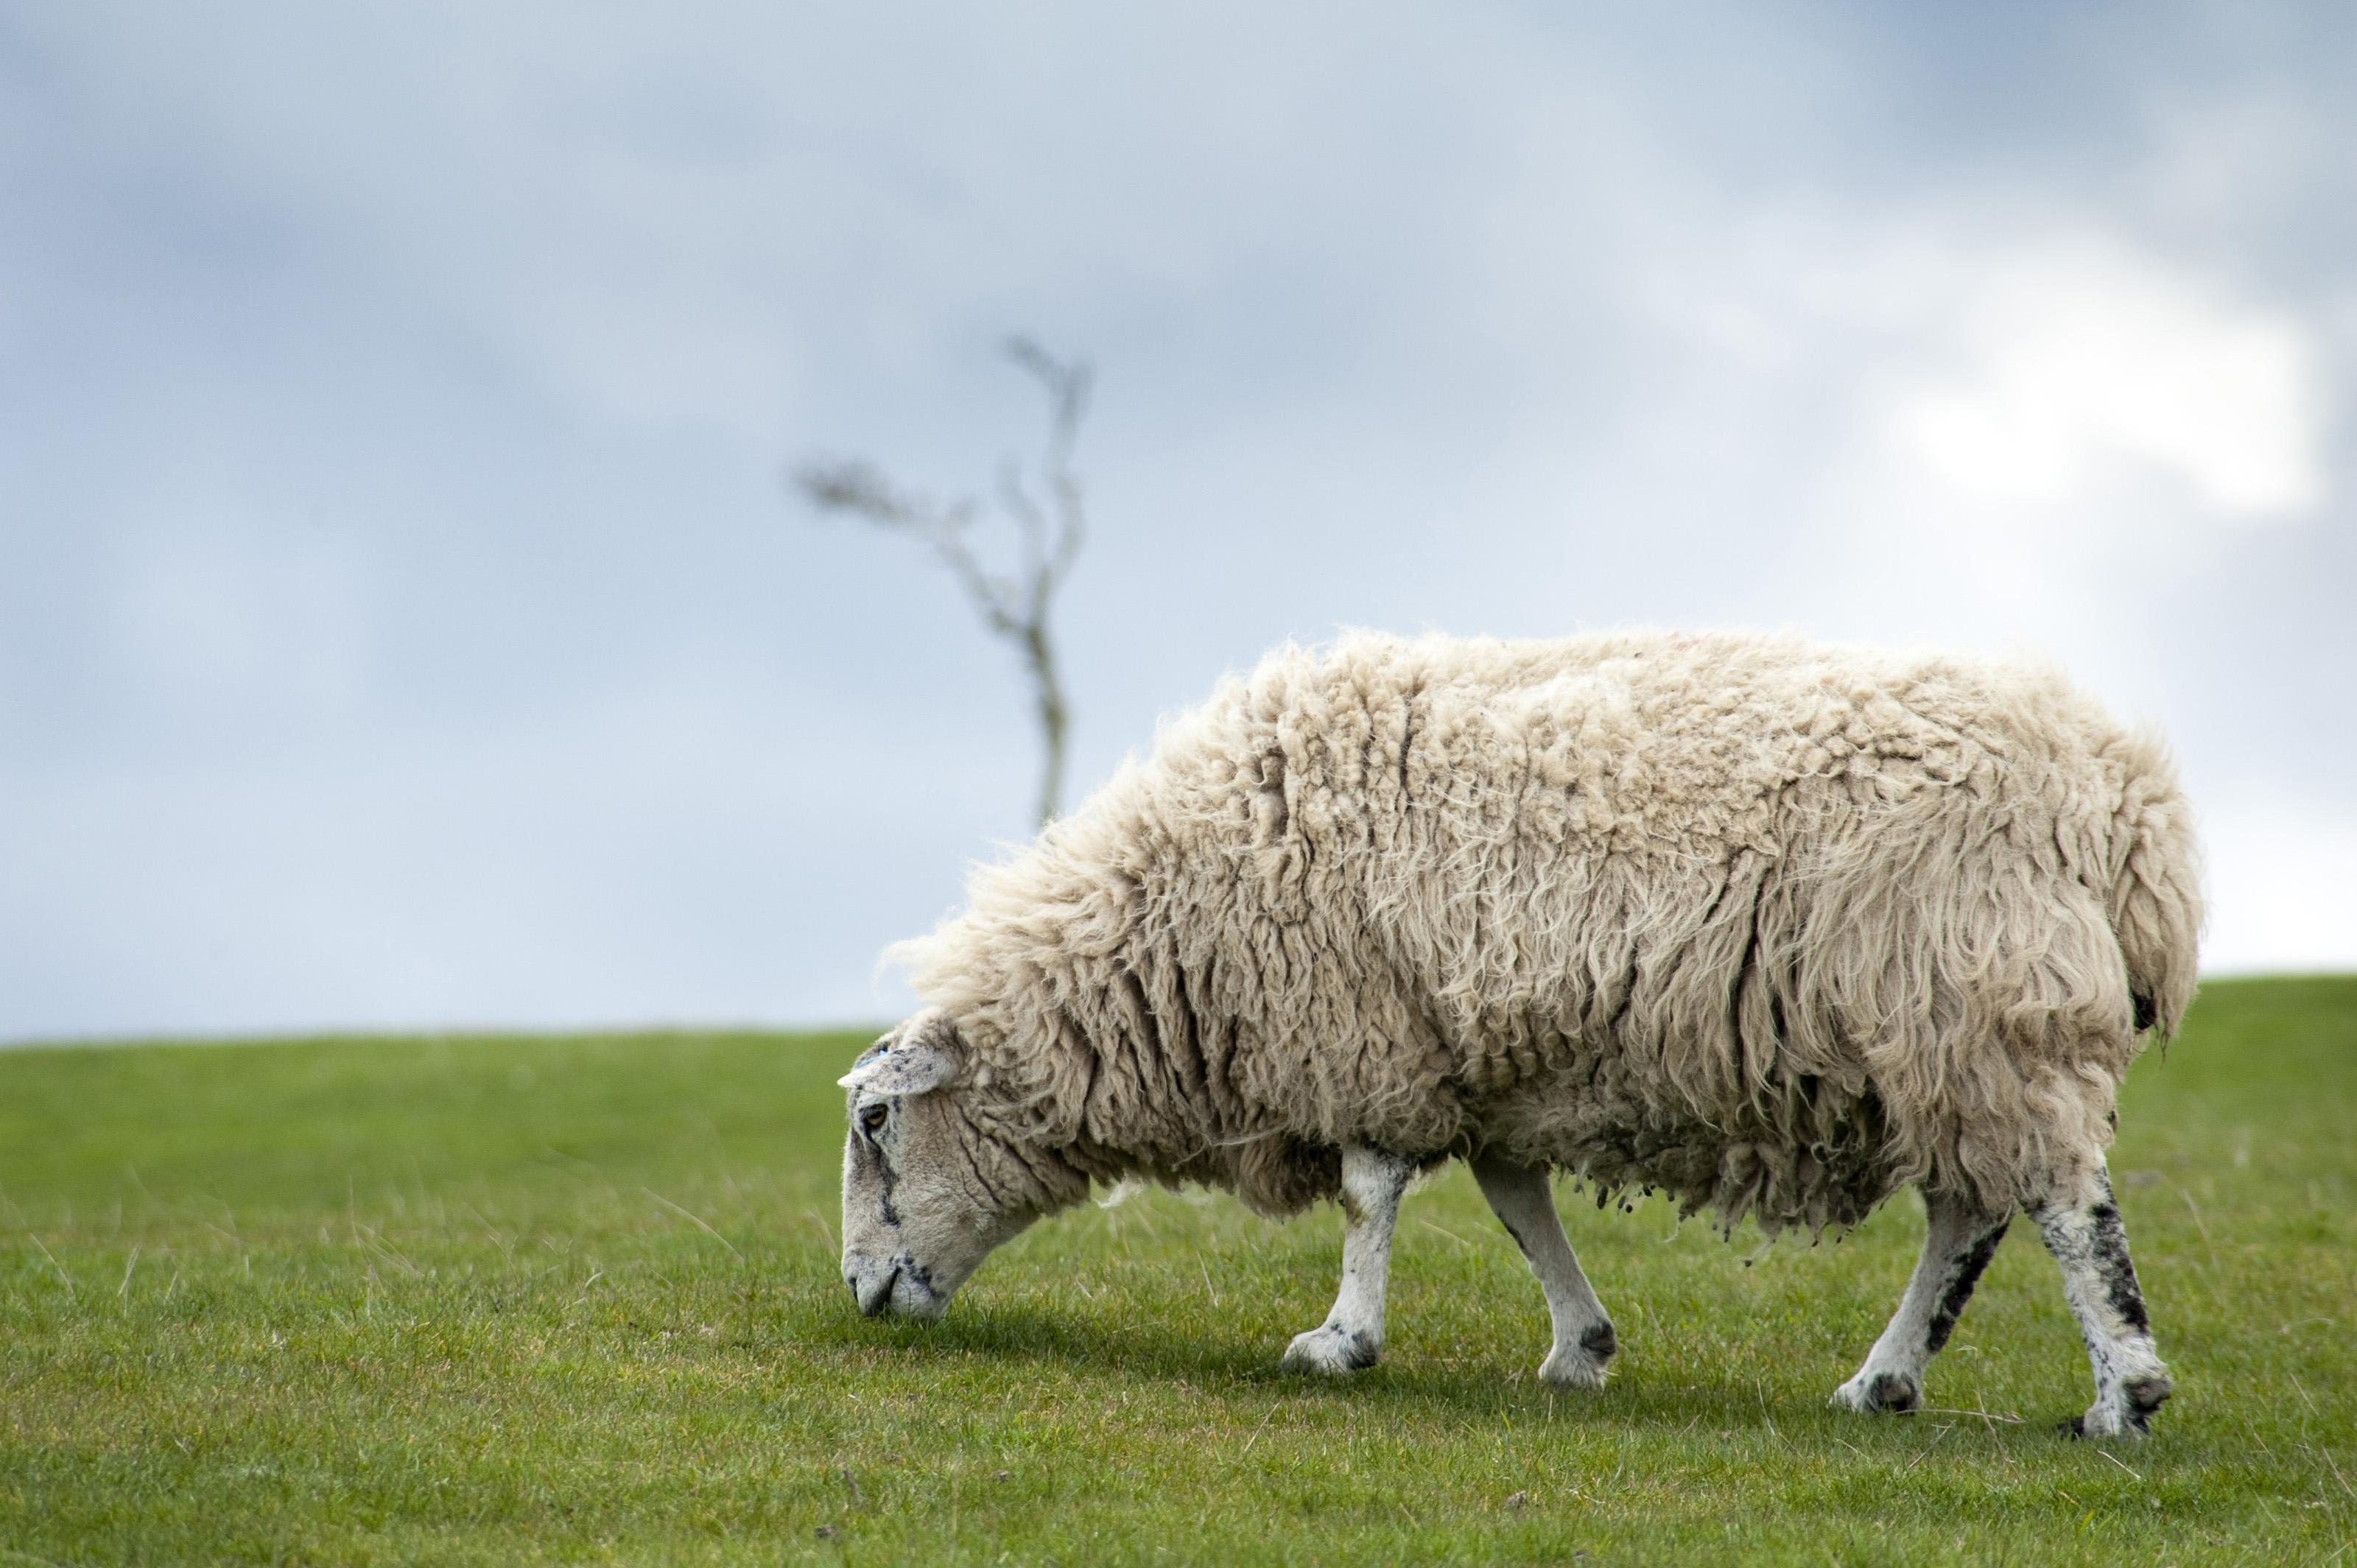 Lone sheep grazing-6779 | Stockarch Free Stock Photos